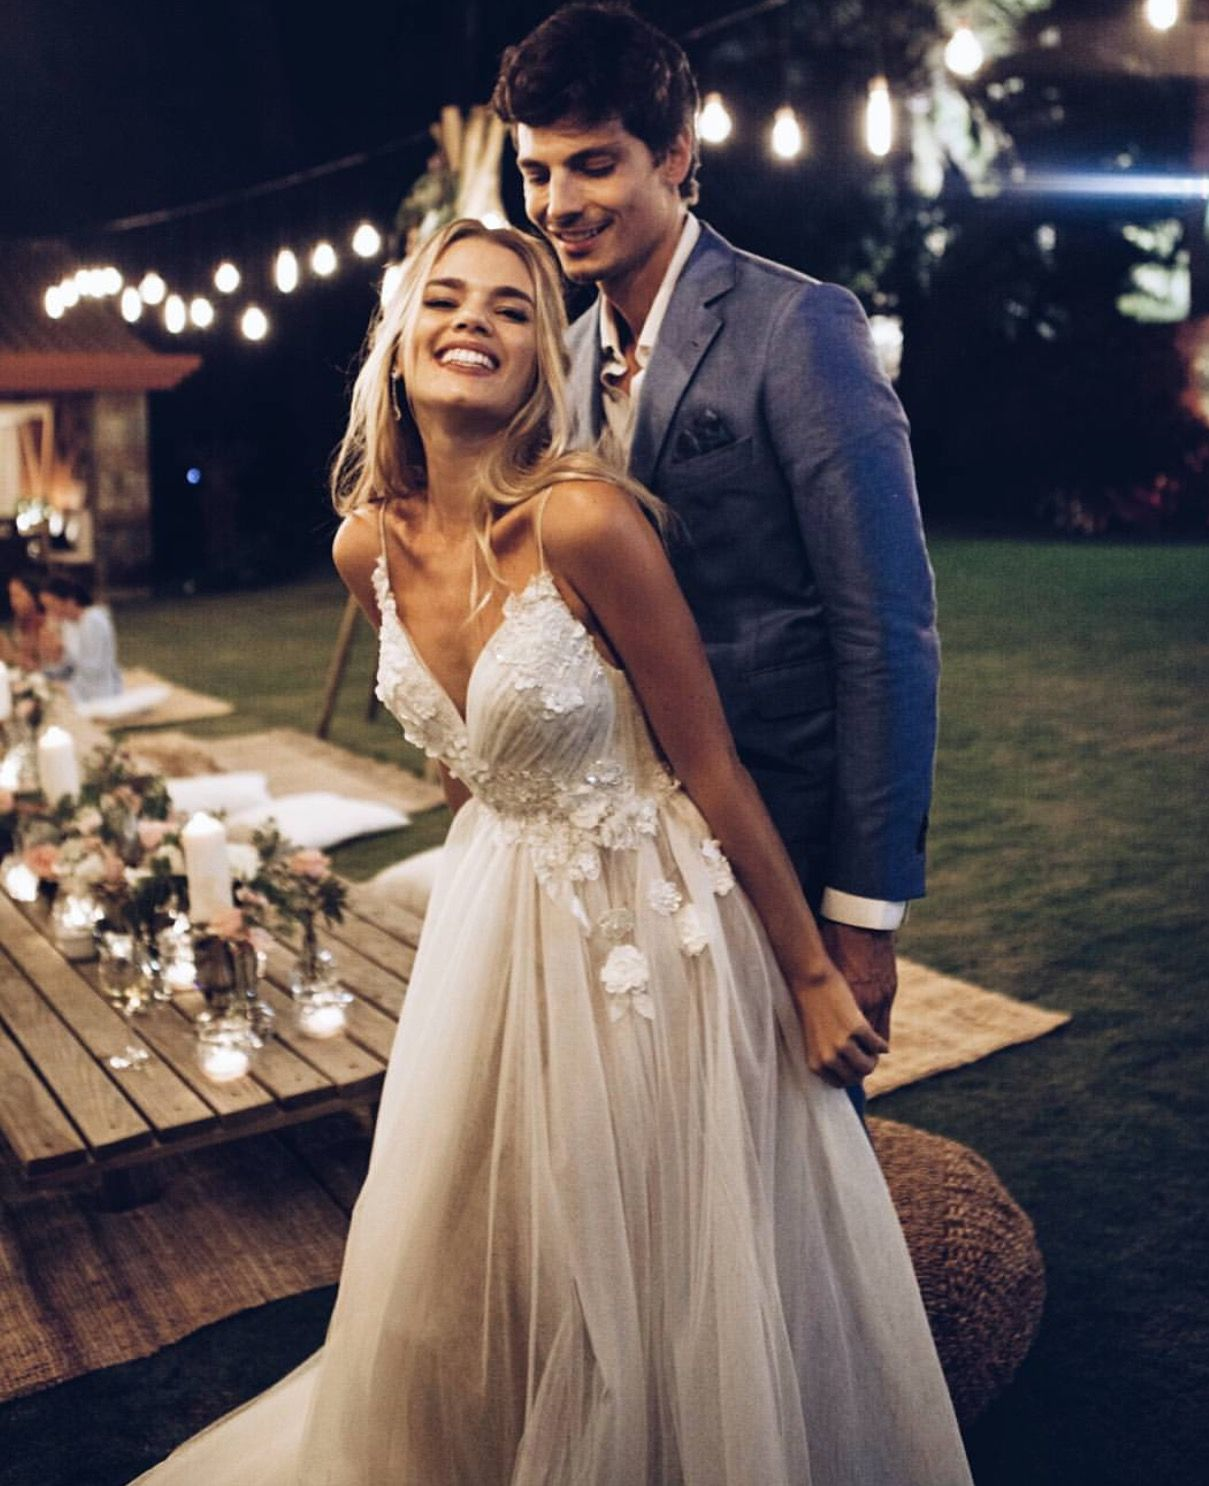 Pin by tate lenkaitis on wedding wishes pinterest wedding